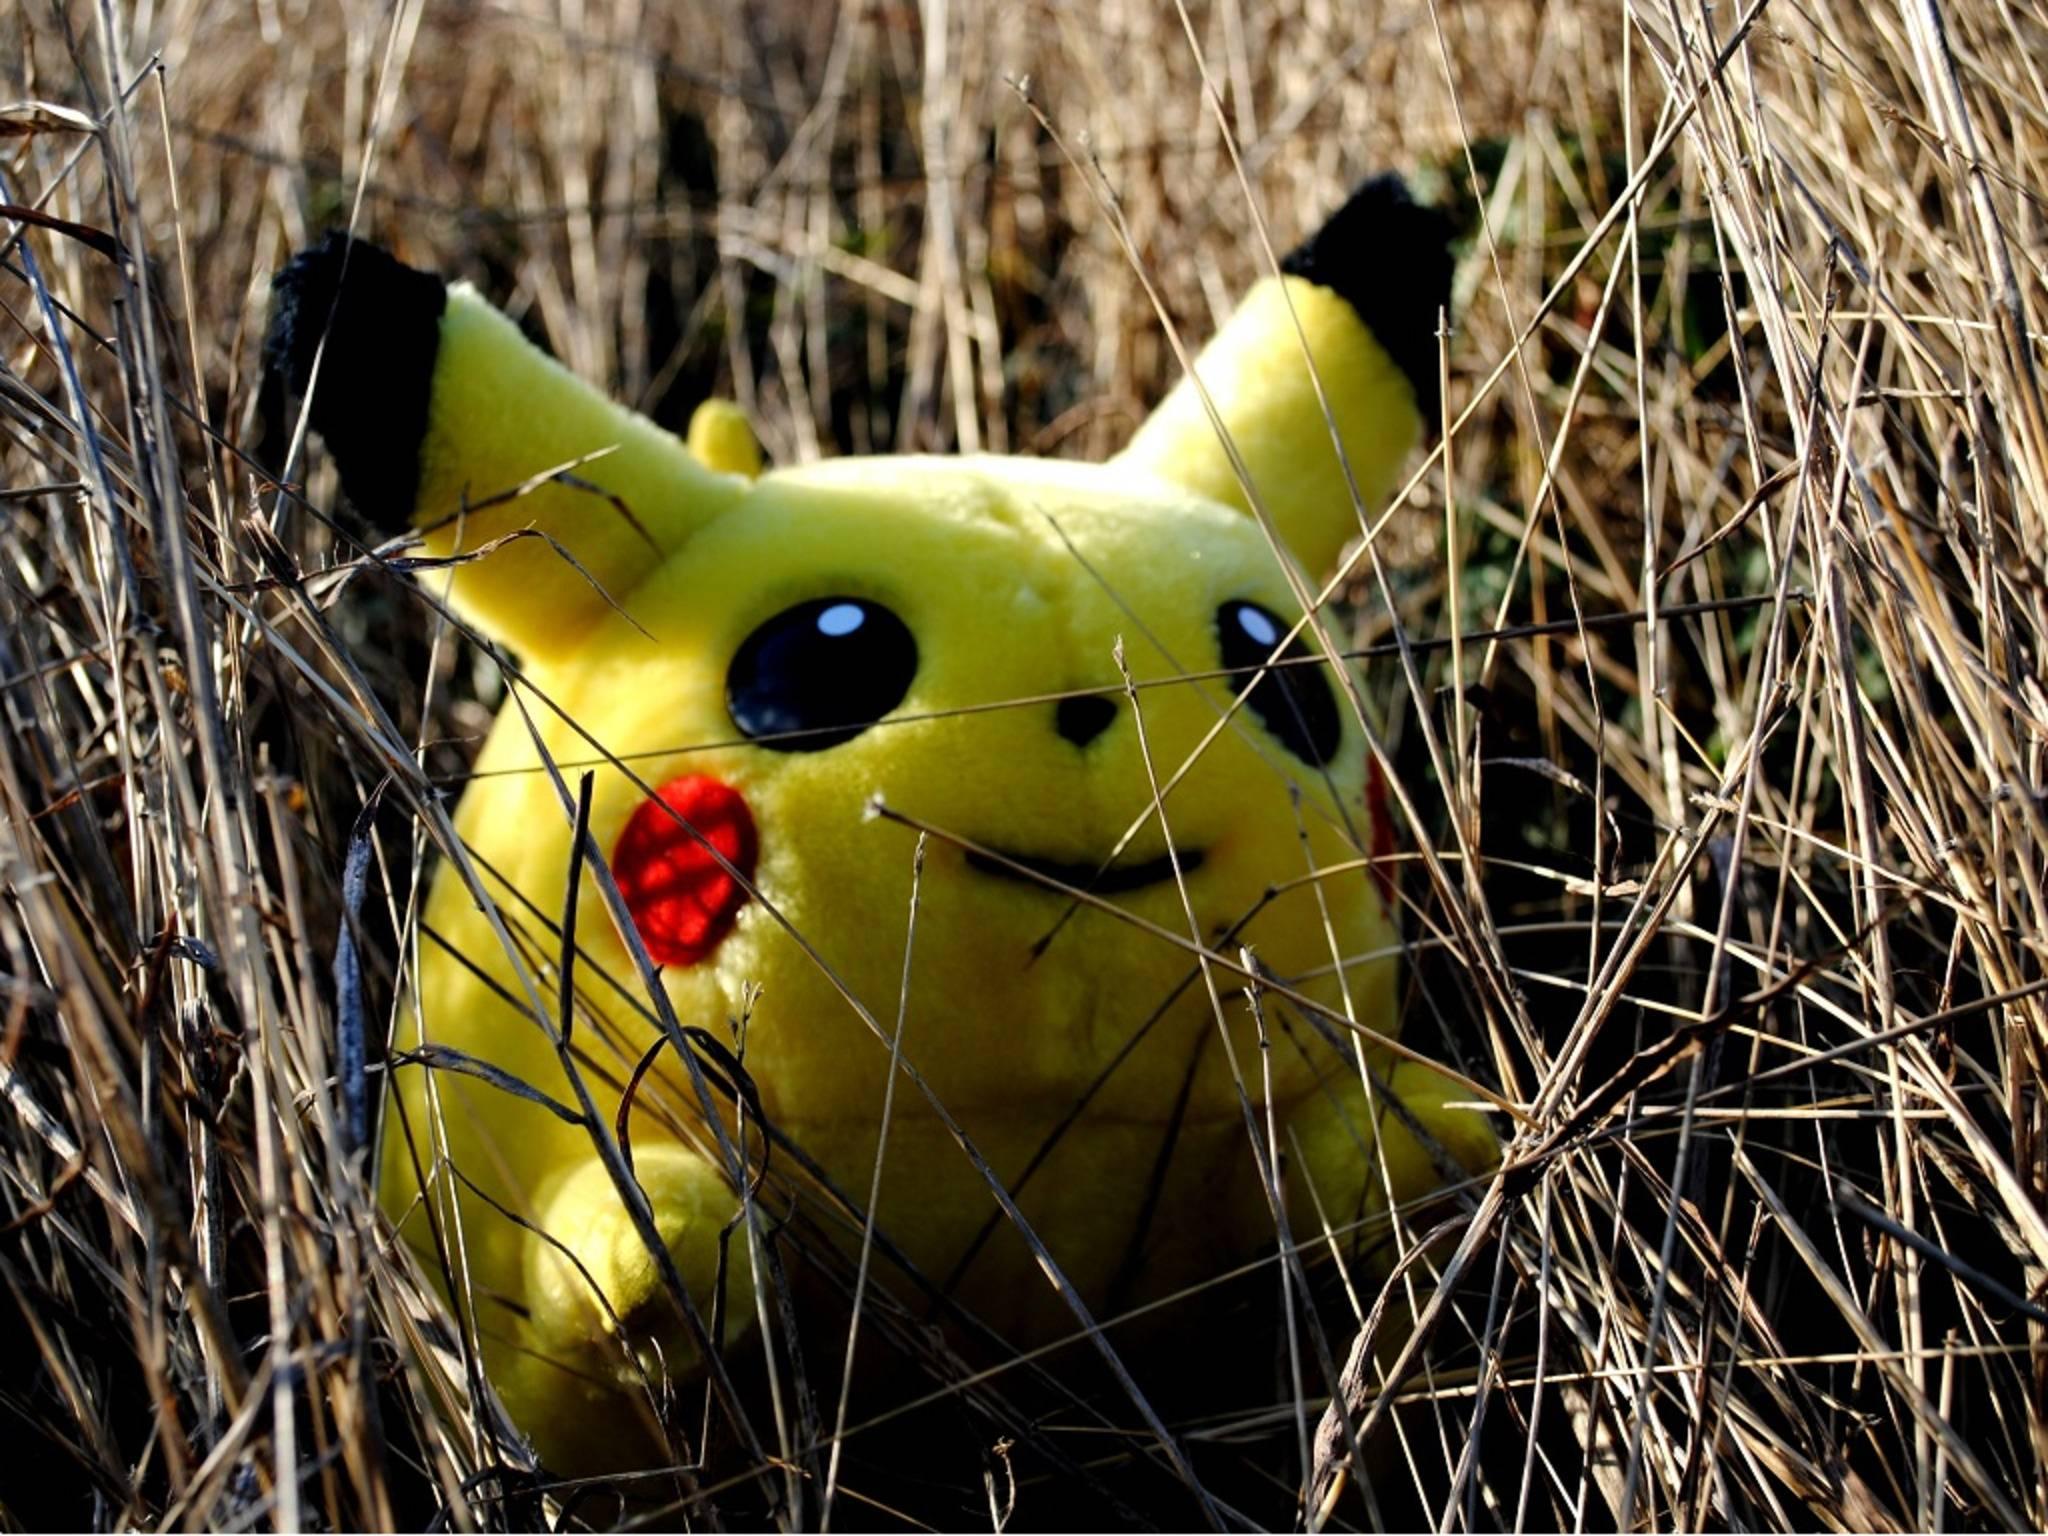 Wo hat sich Pikachu versteckt? Poké Live verrät es Dir.